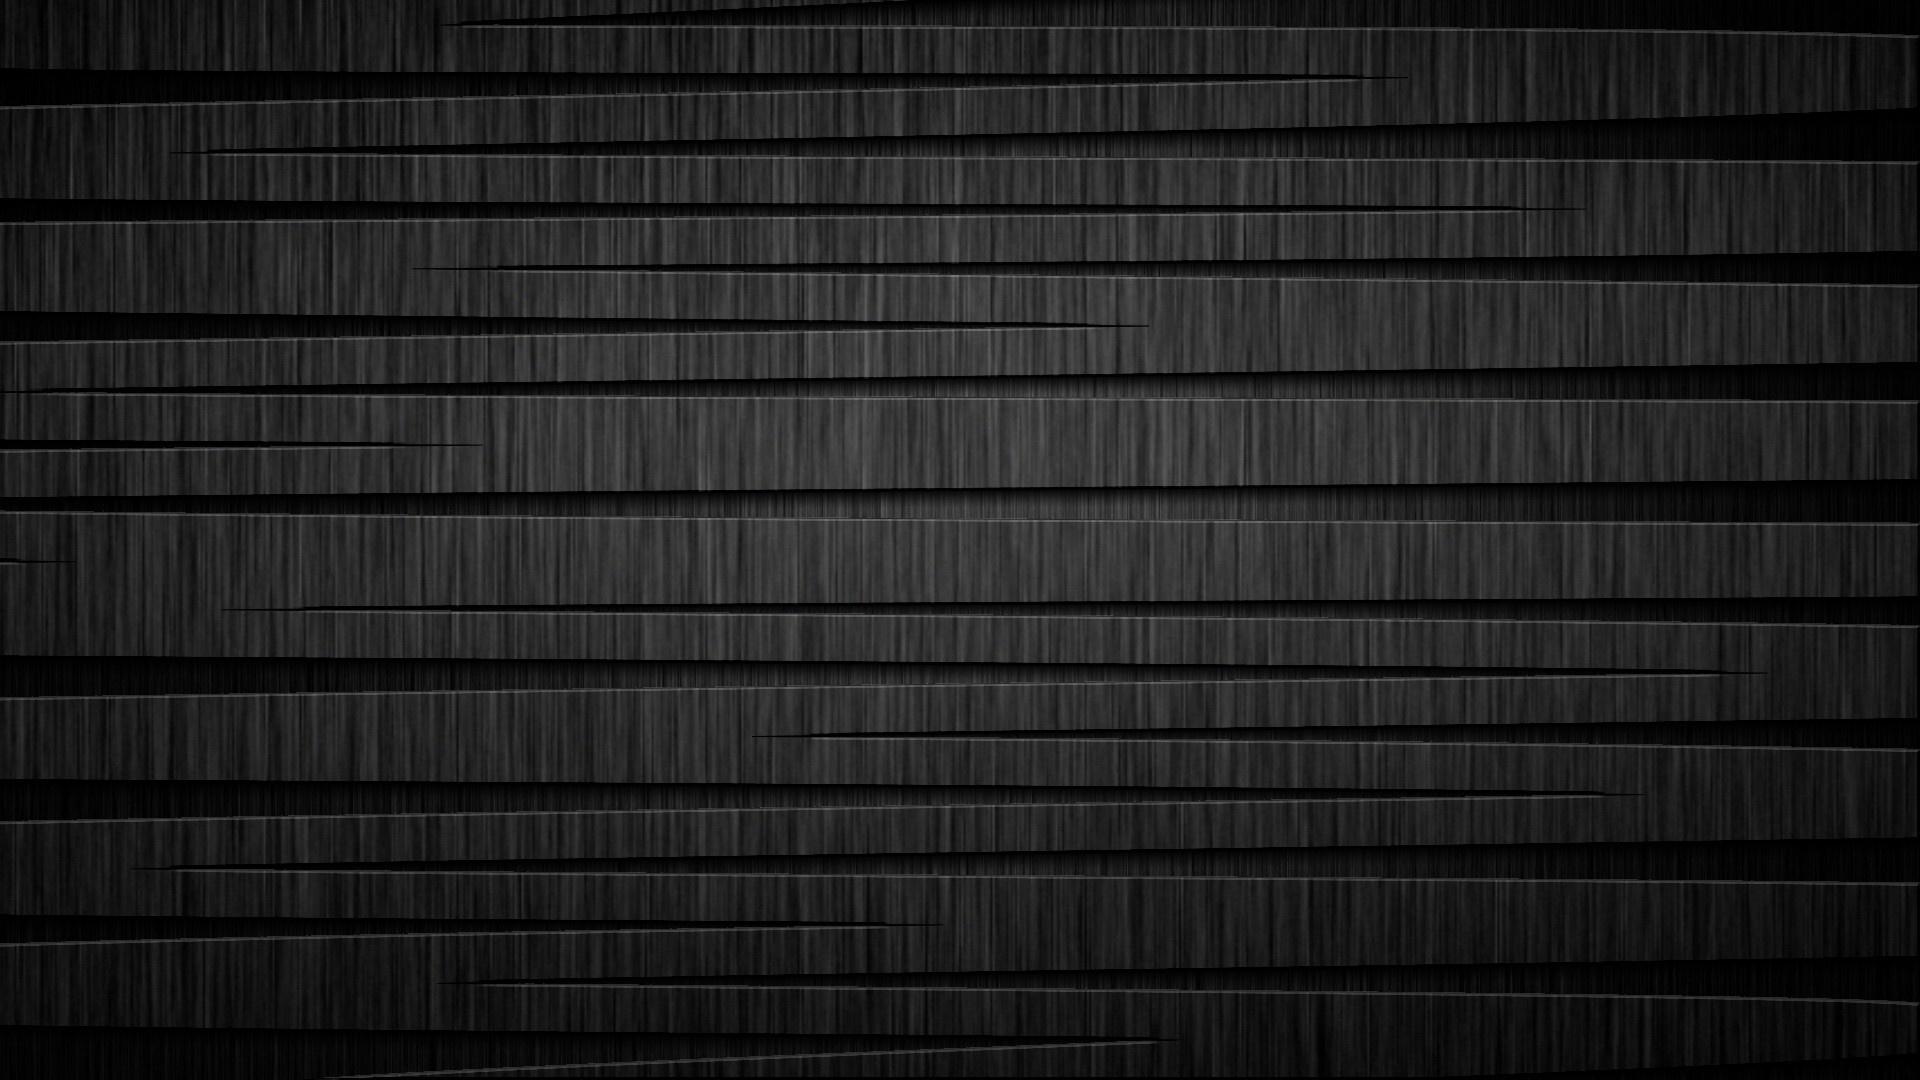 Wallpaper Dark Wall Text Symmetry Texture Circle Lines